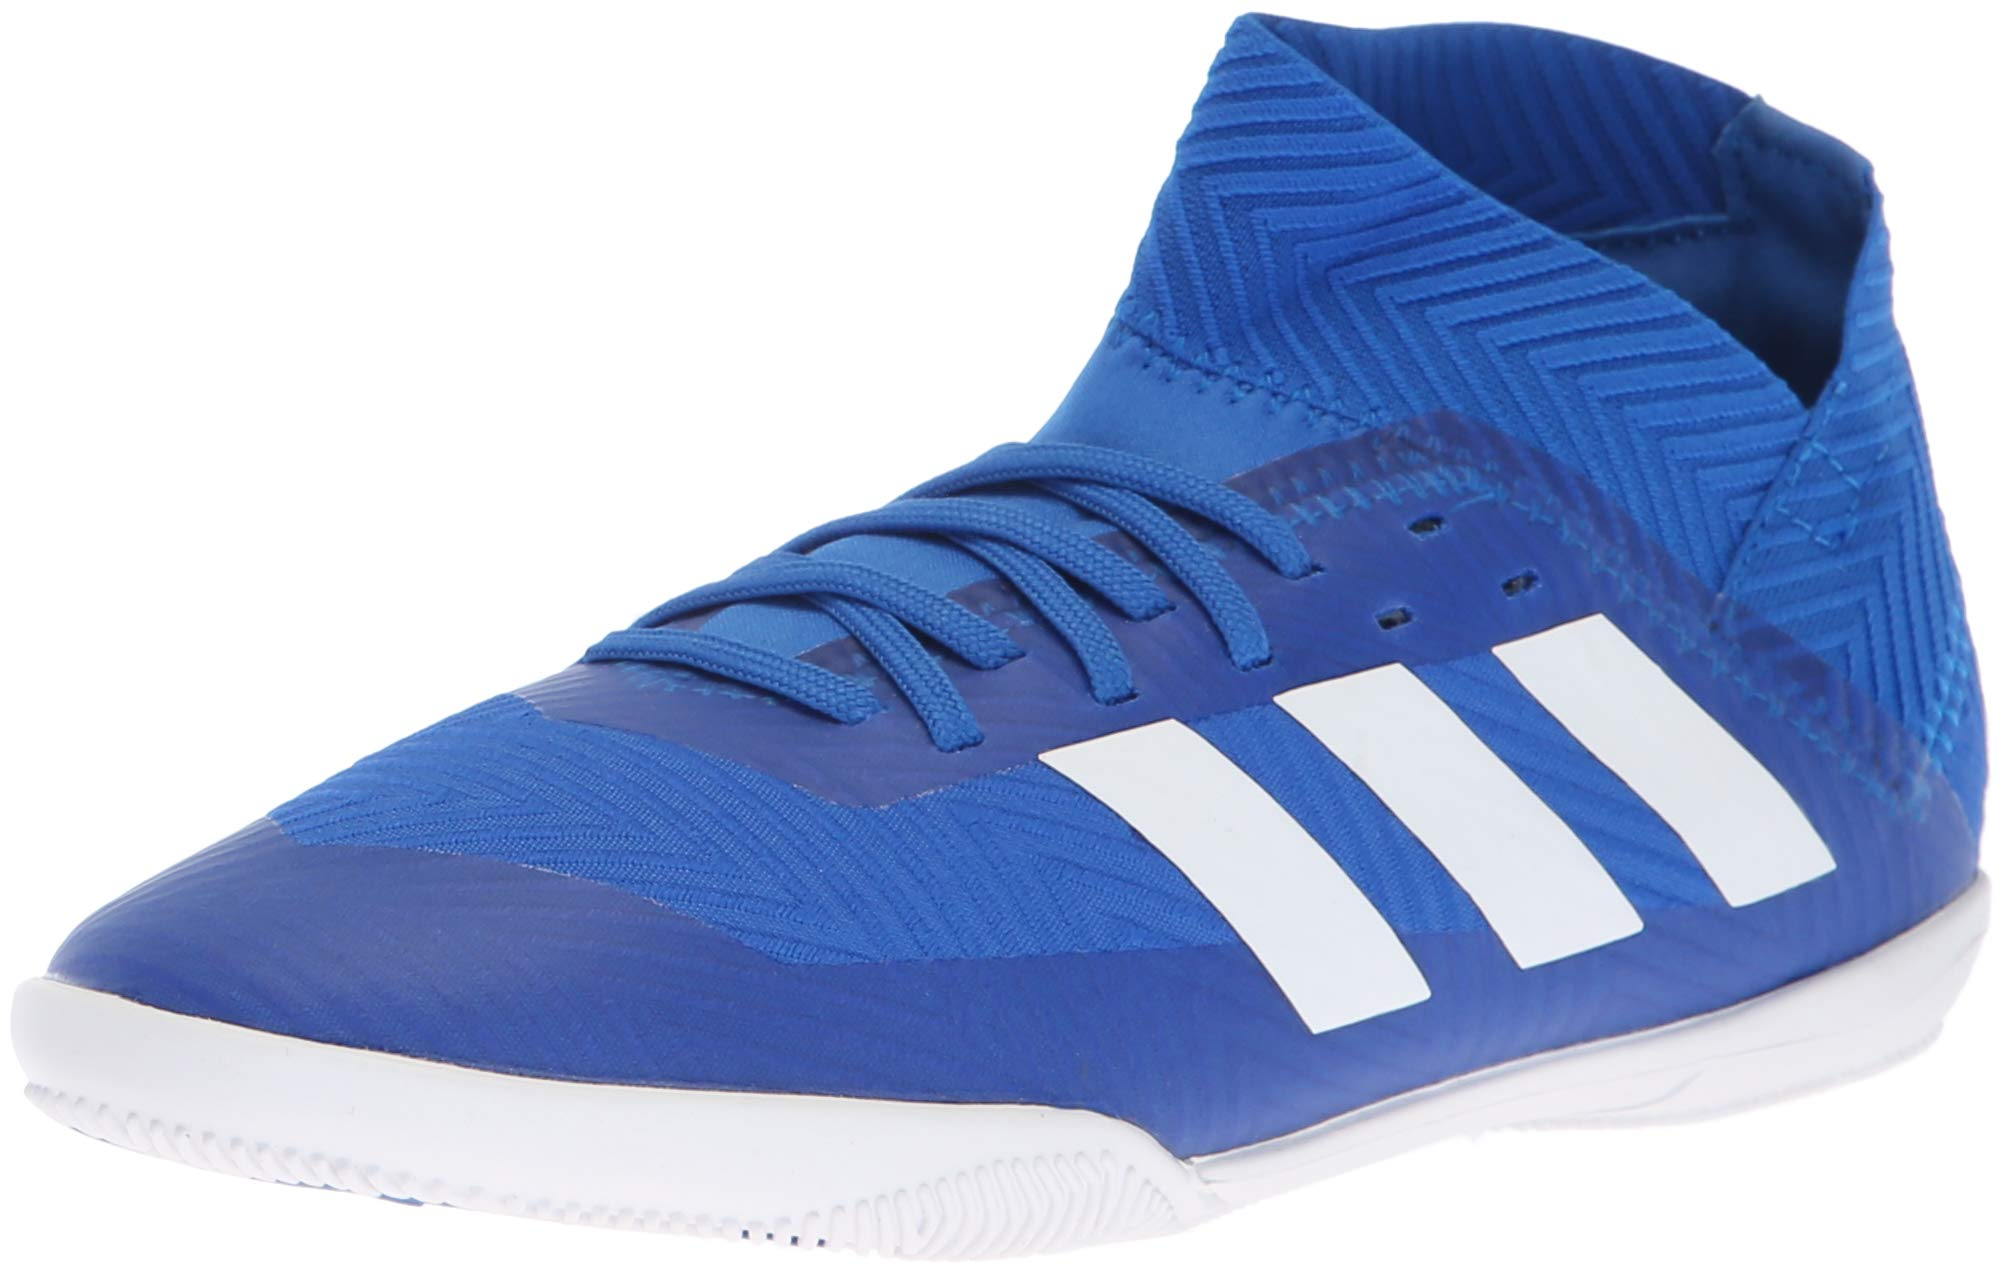 adidas Unisex Nemeziz Tango 18.3 Indoor Soccer Shoe, Football Blue/White/Black, 4 M US Big Kid